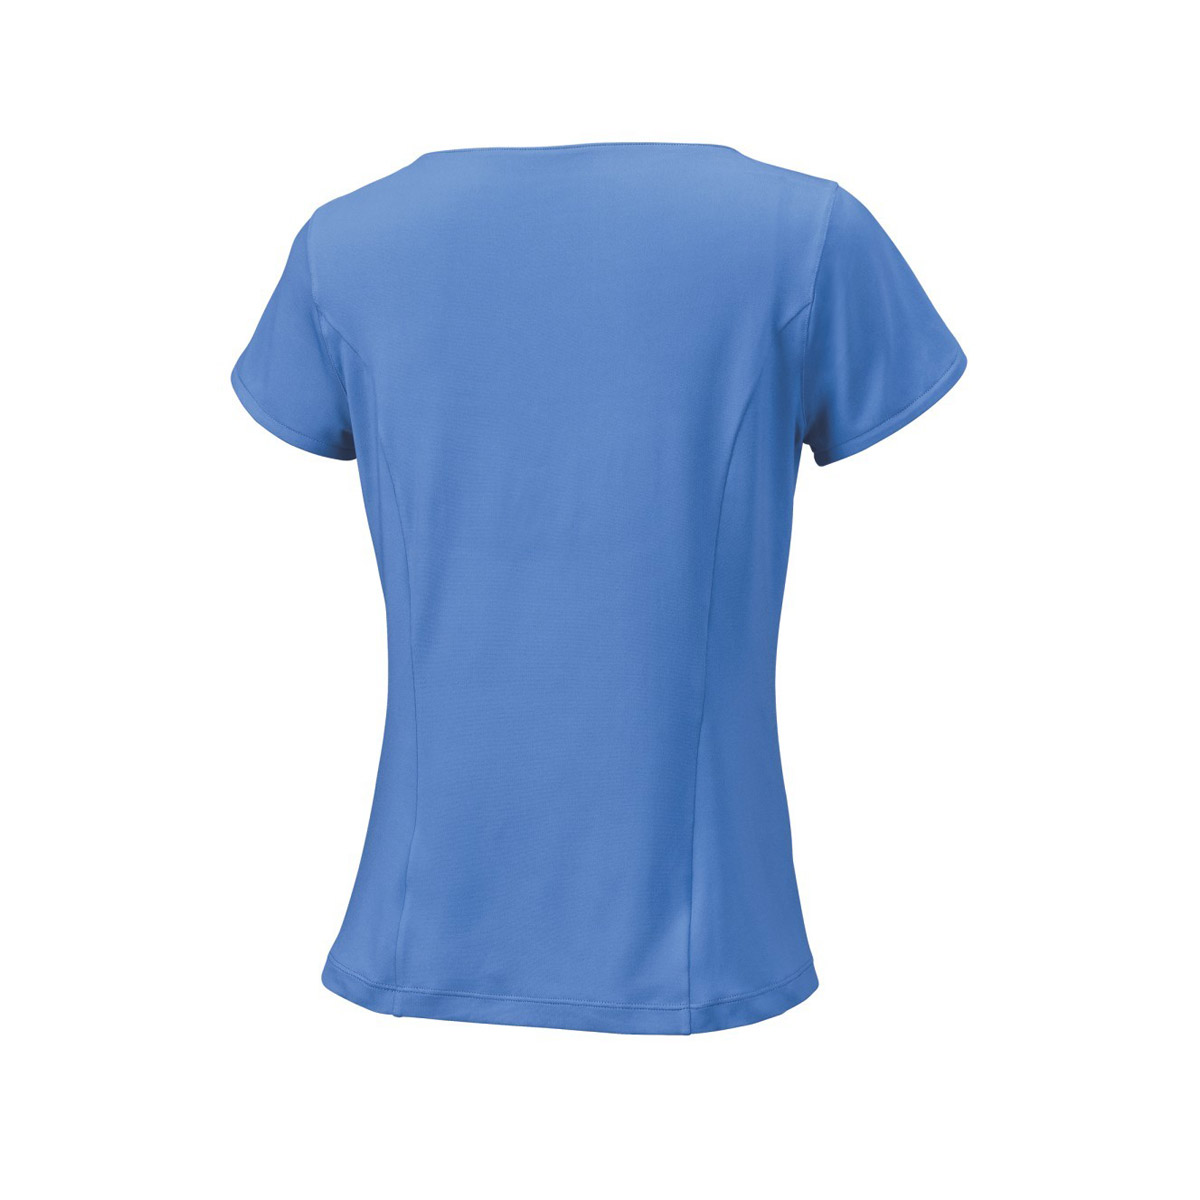 blue star clothing co - photo #45